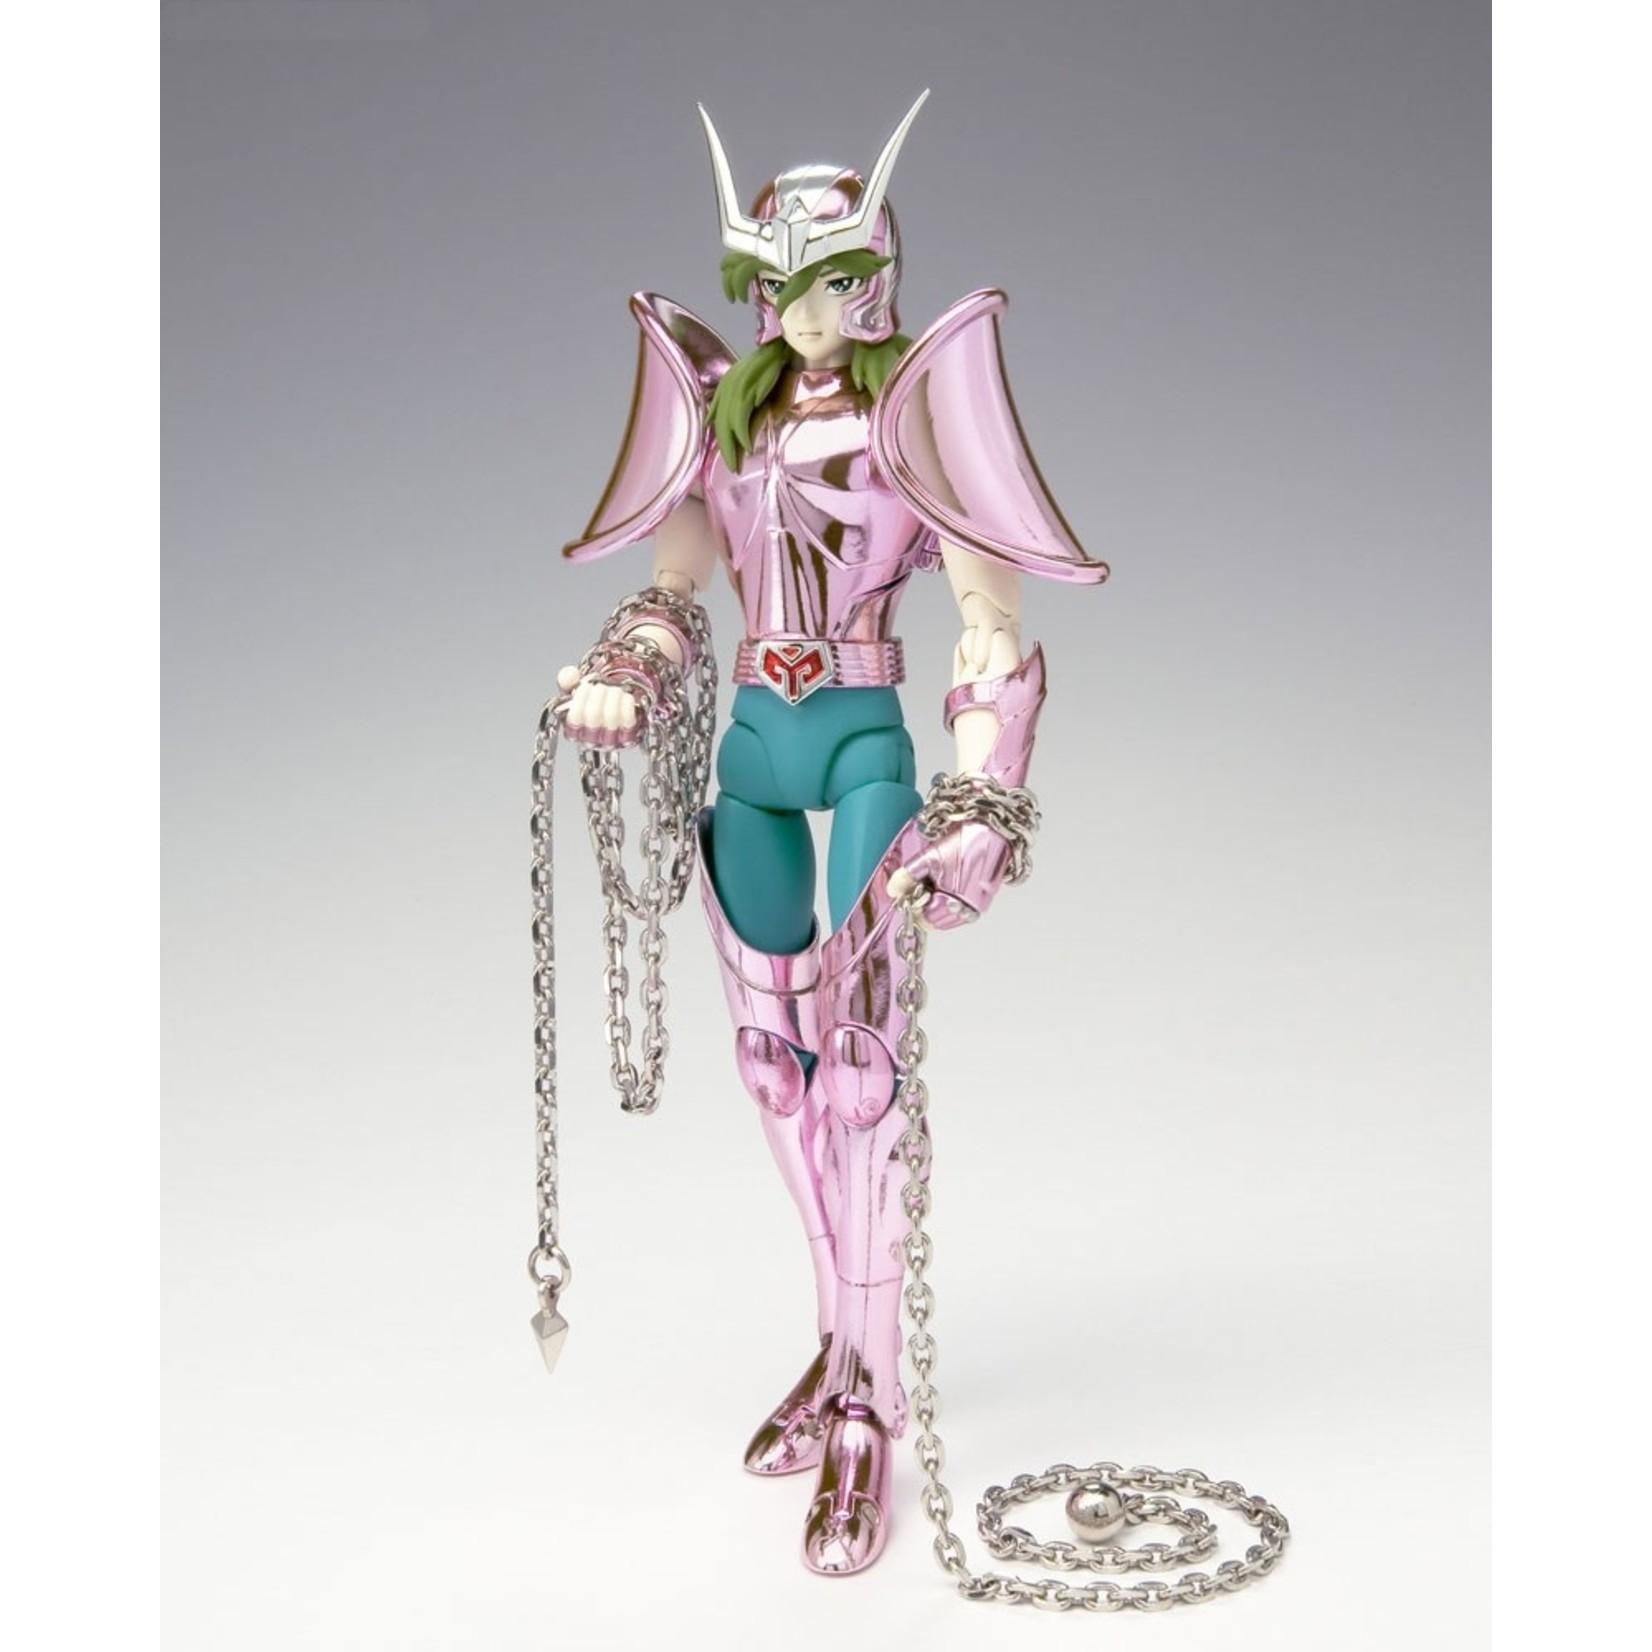 Bandai Saint Seiya - Andromeda Shun  - Myth Cloth - 1st Cloth Ver.